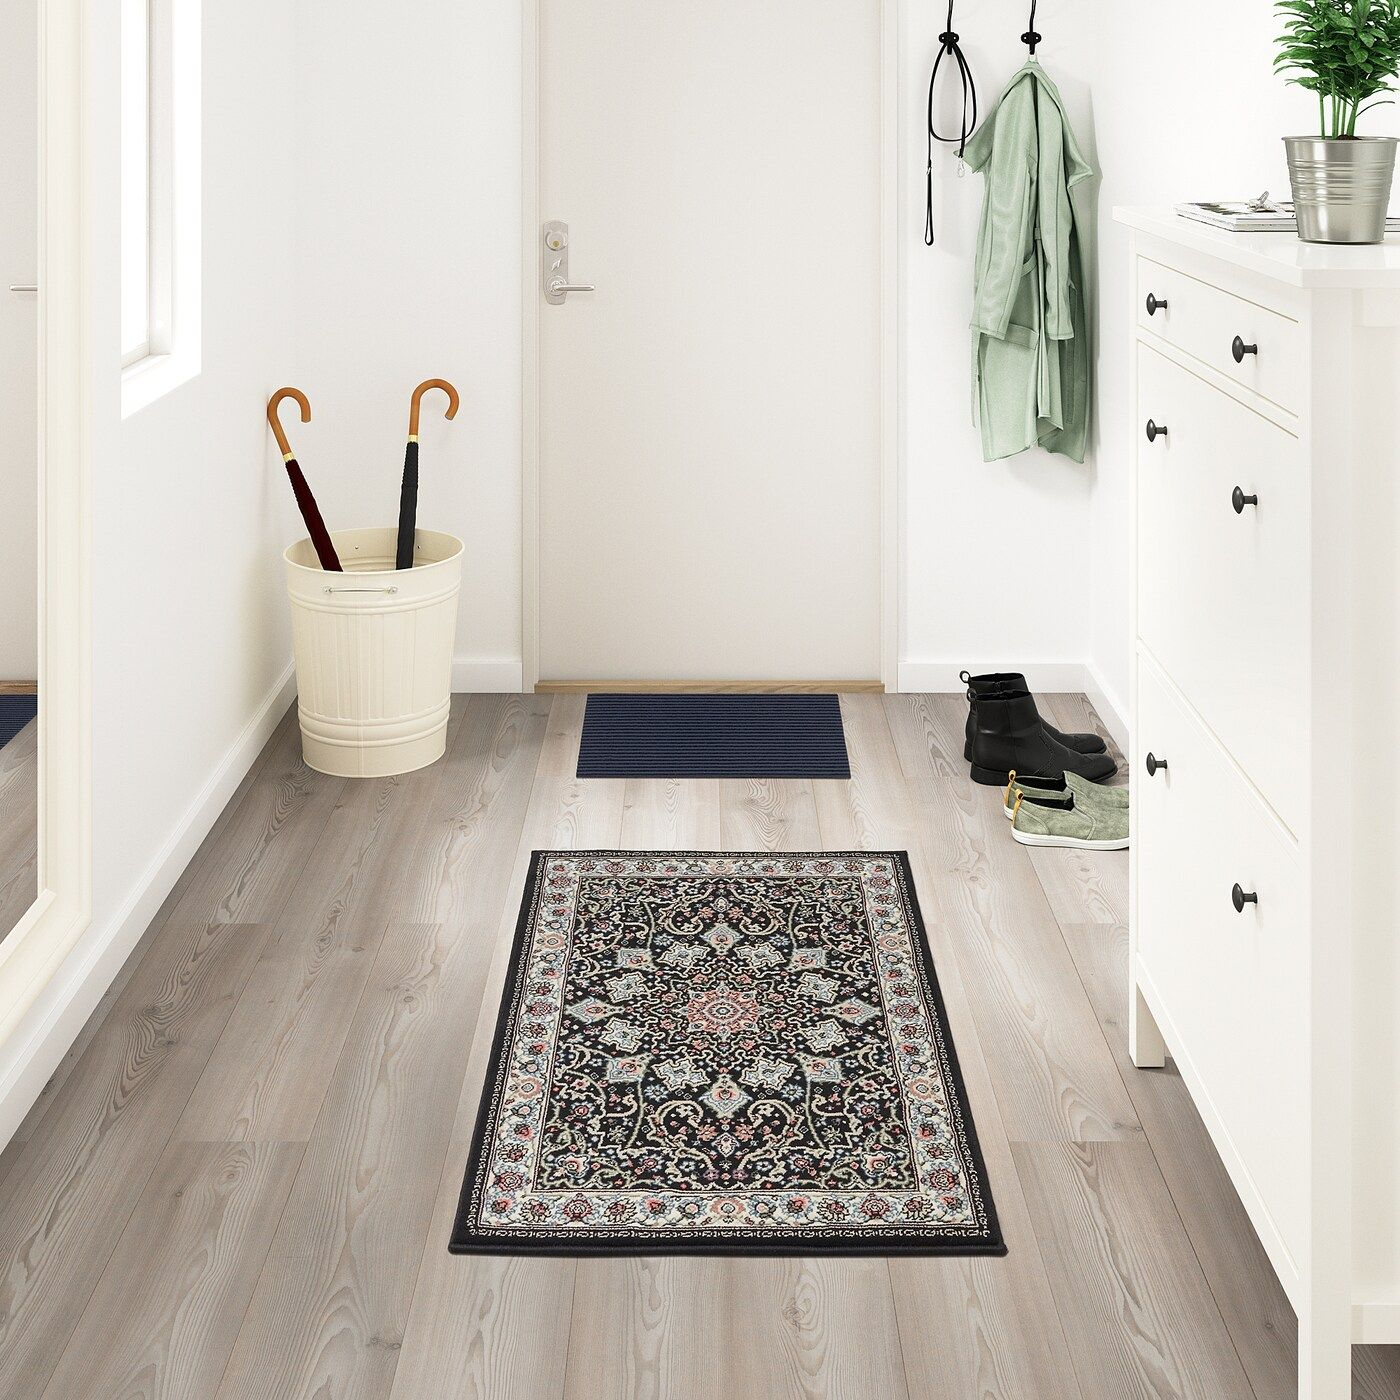 LjÖrring Teppich Kurzflor Bunt Heute Noch Kaufen Ikea Österreich Vloerkleed Ikea Vloerkleed Laagpolig